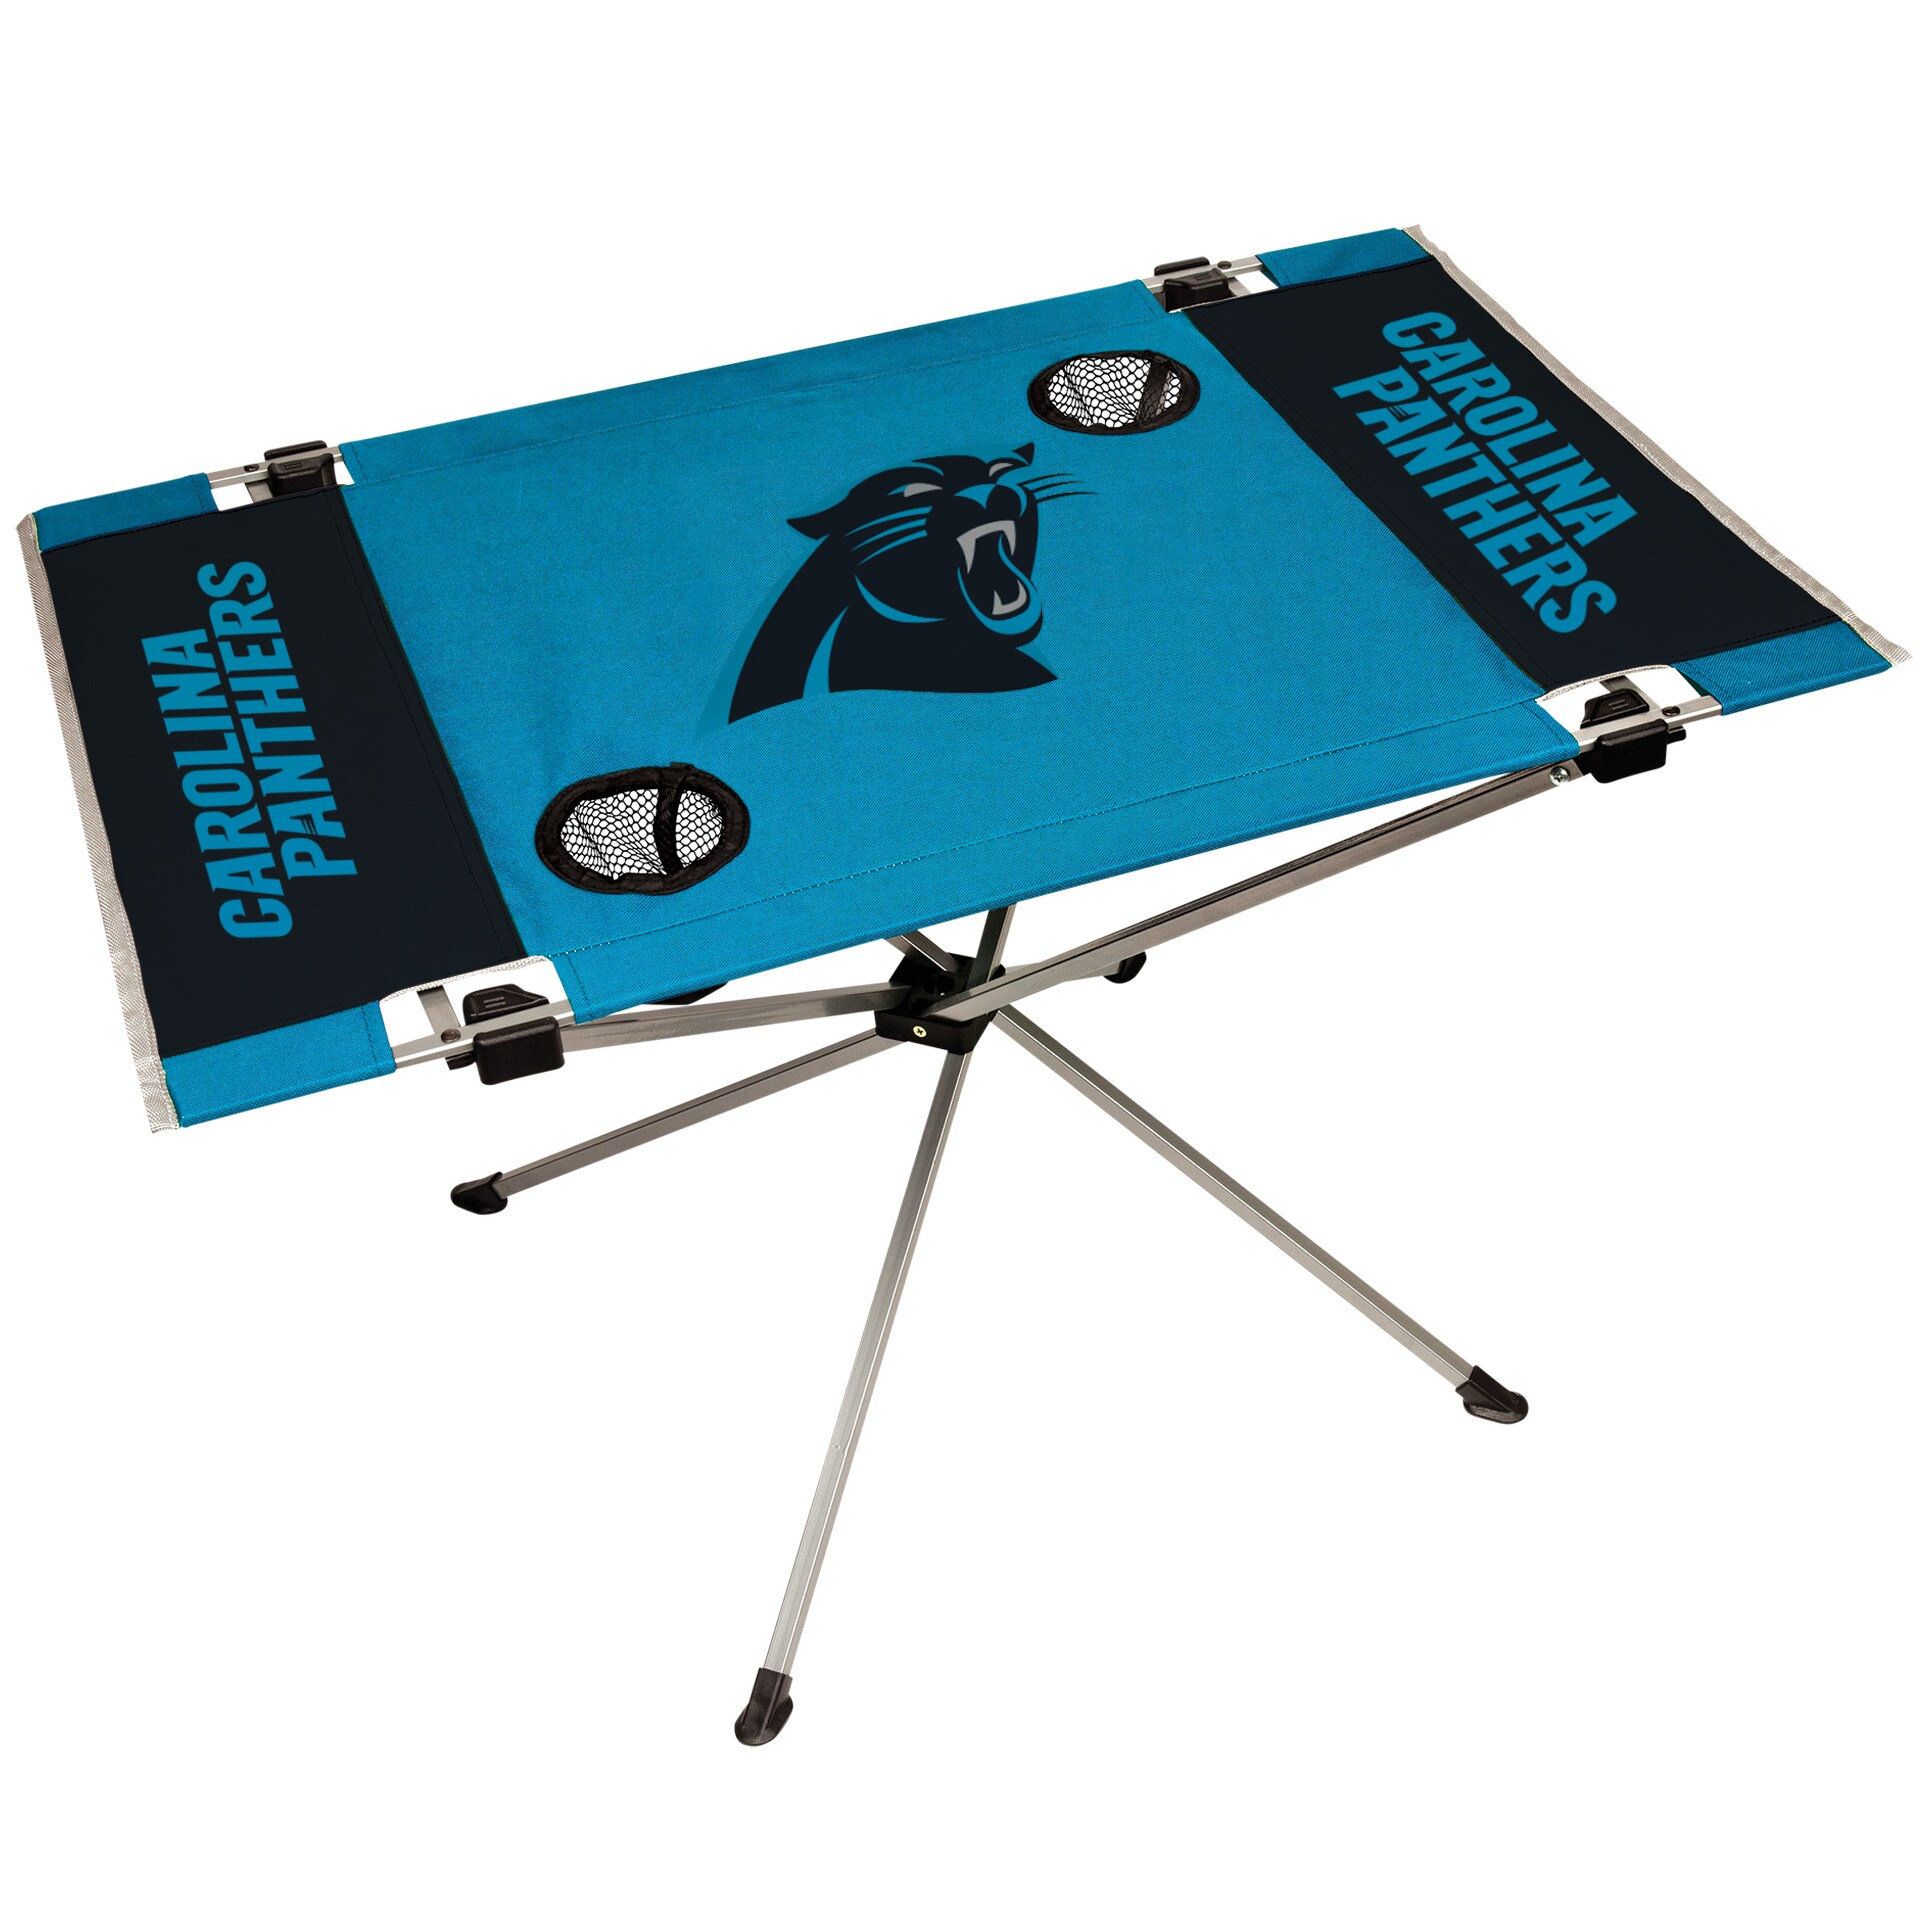 Carolina Panthers End Zone Table